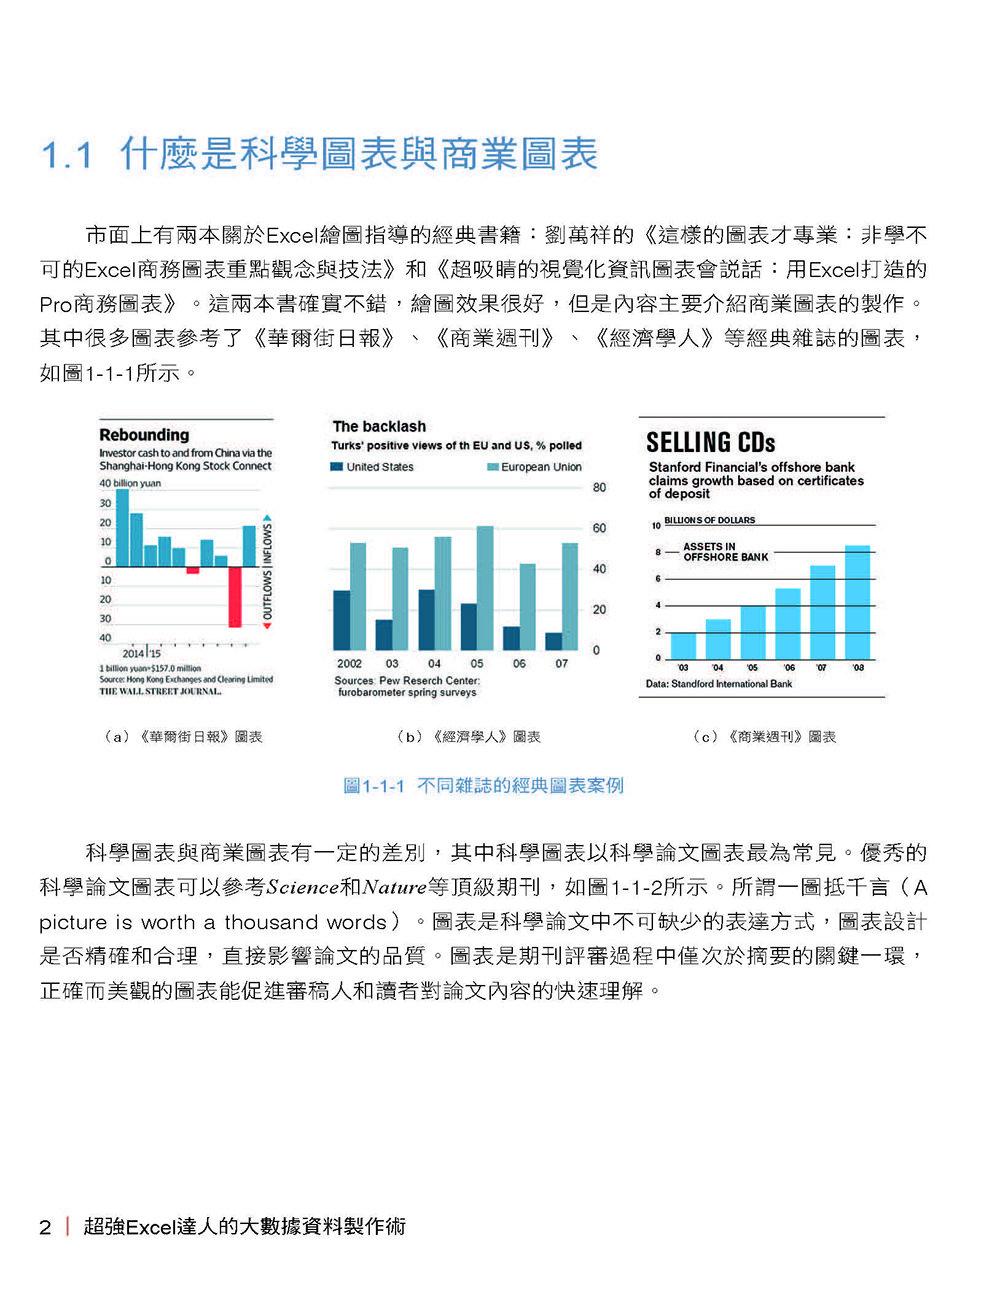 《The Wall Street Journal》與《Business Week》都在用的商務圖表技法:超強Excel達人的大數據資料製作術-preview-3